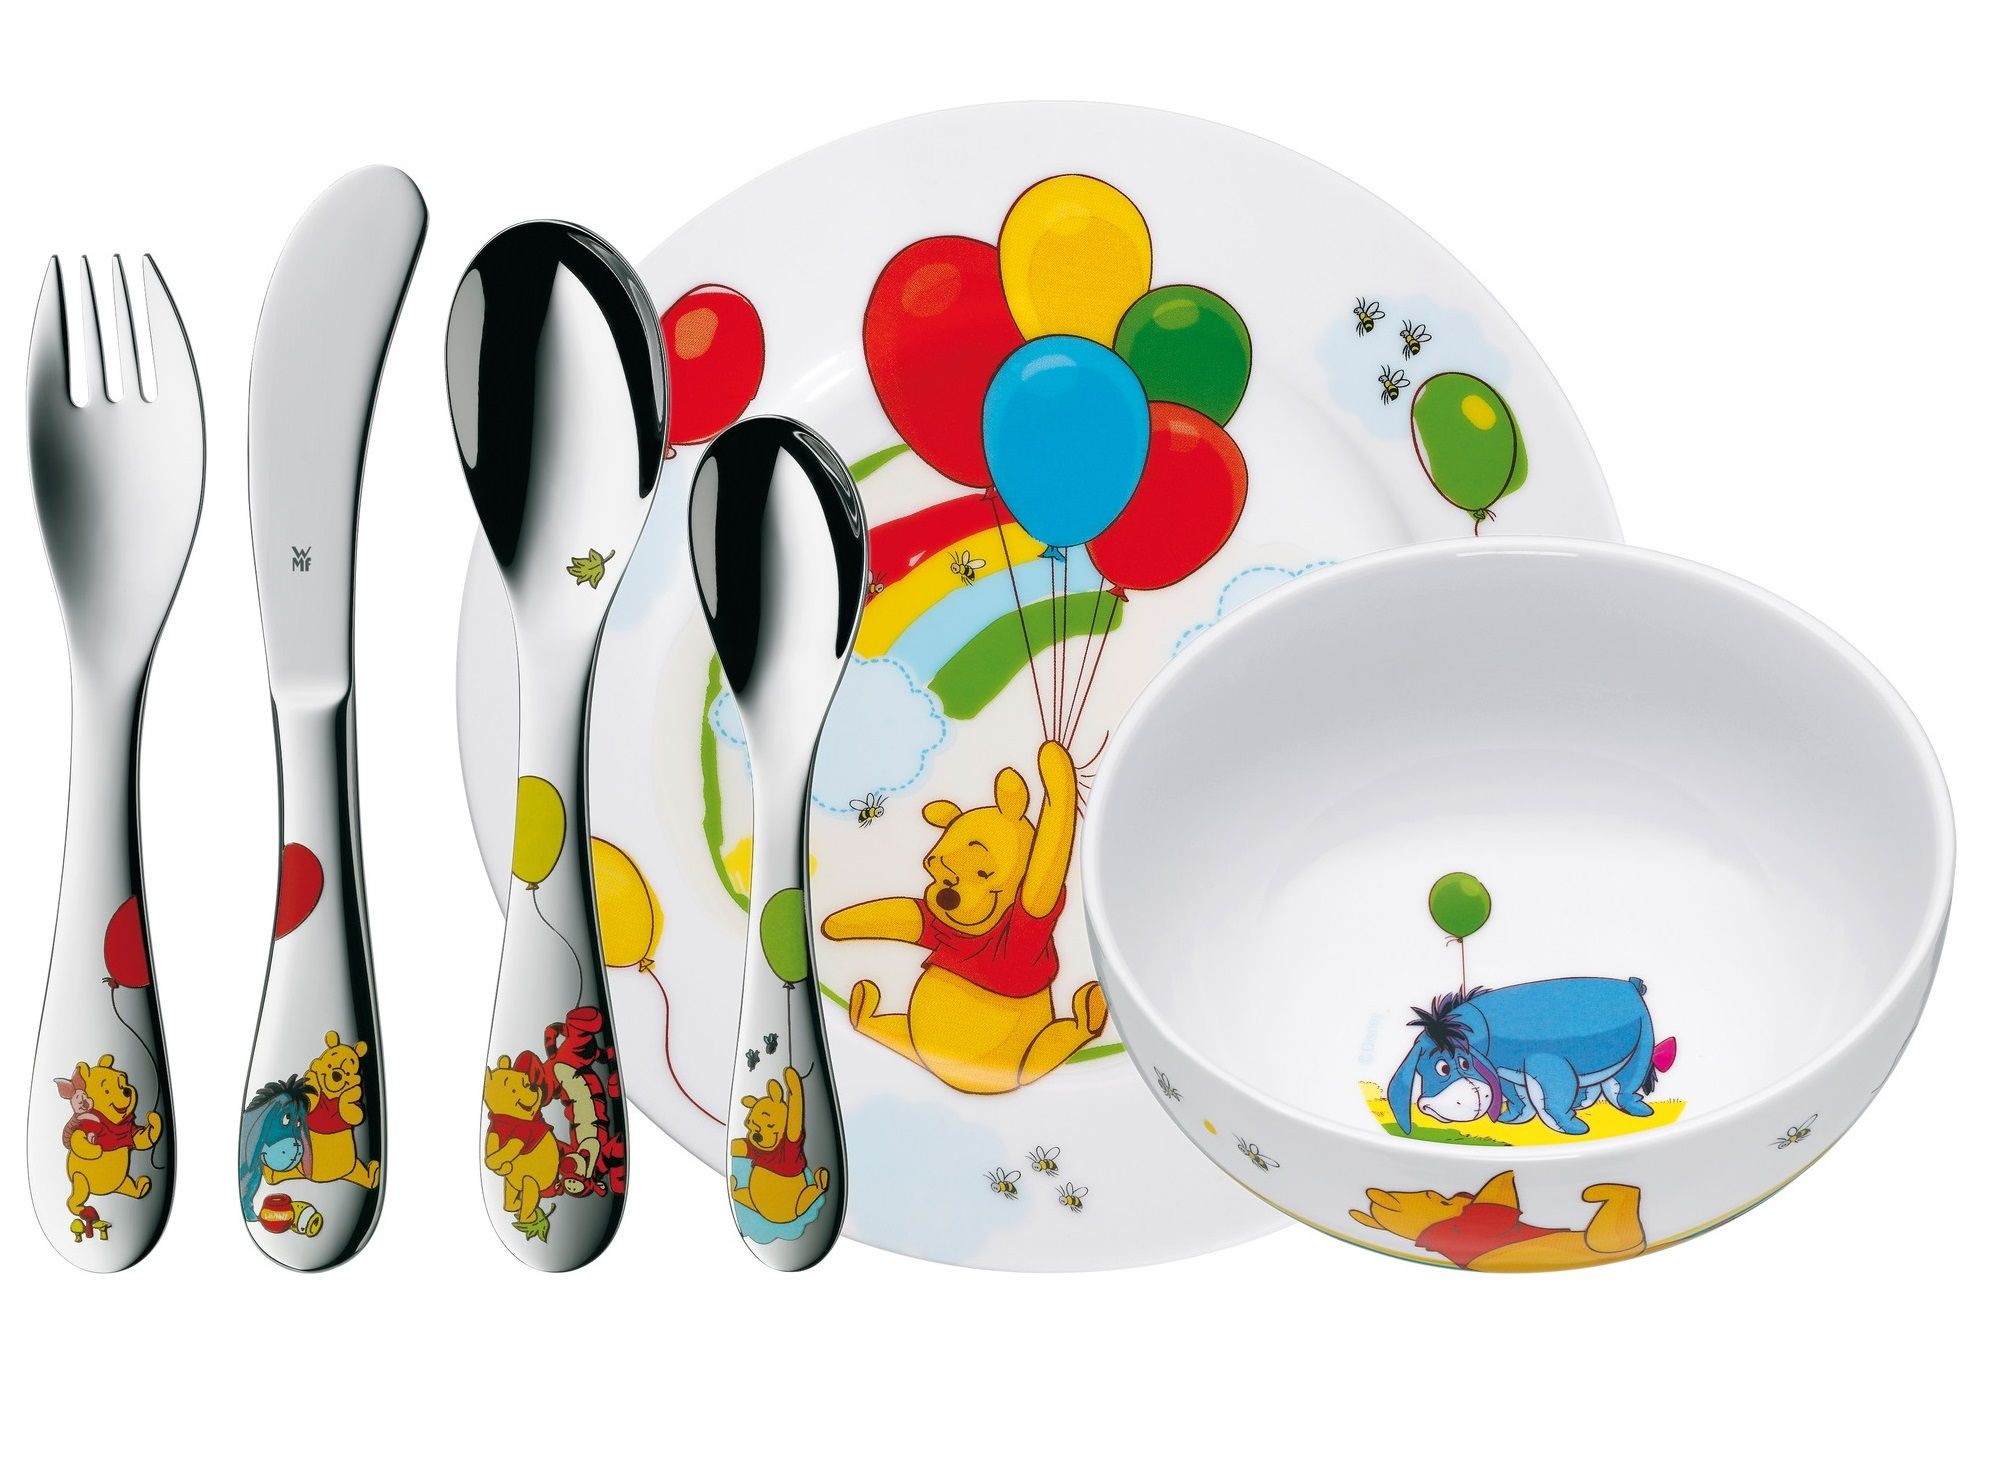 WMF Kinderbestek Kids Disney Winnie de Poeh 6-Delig